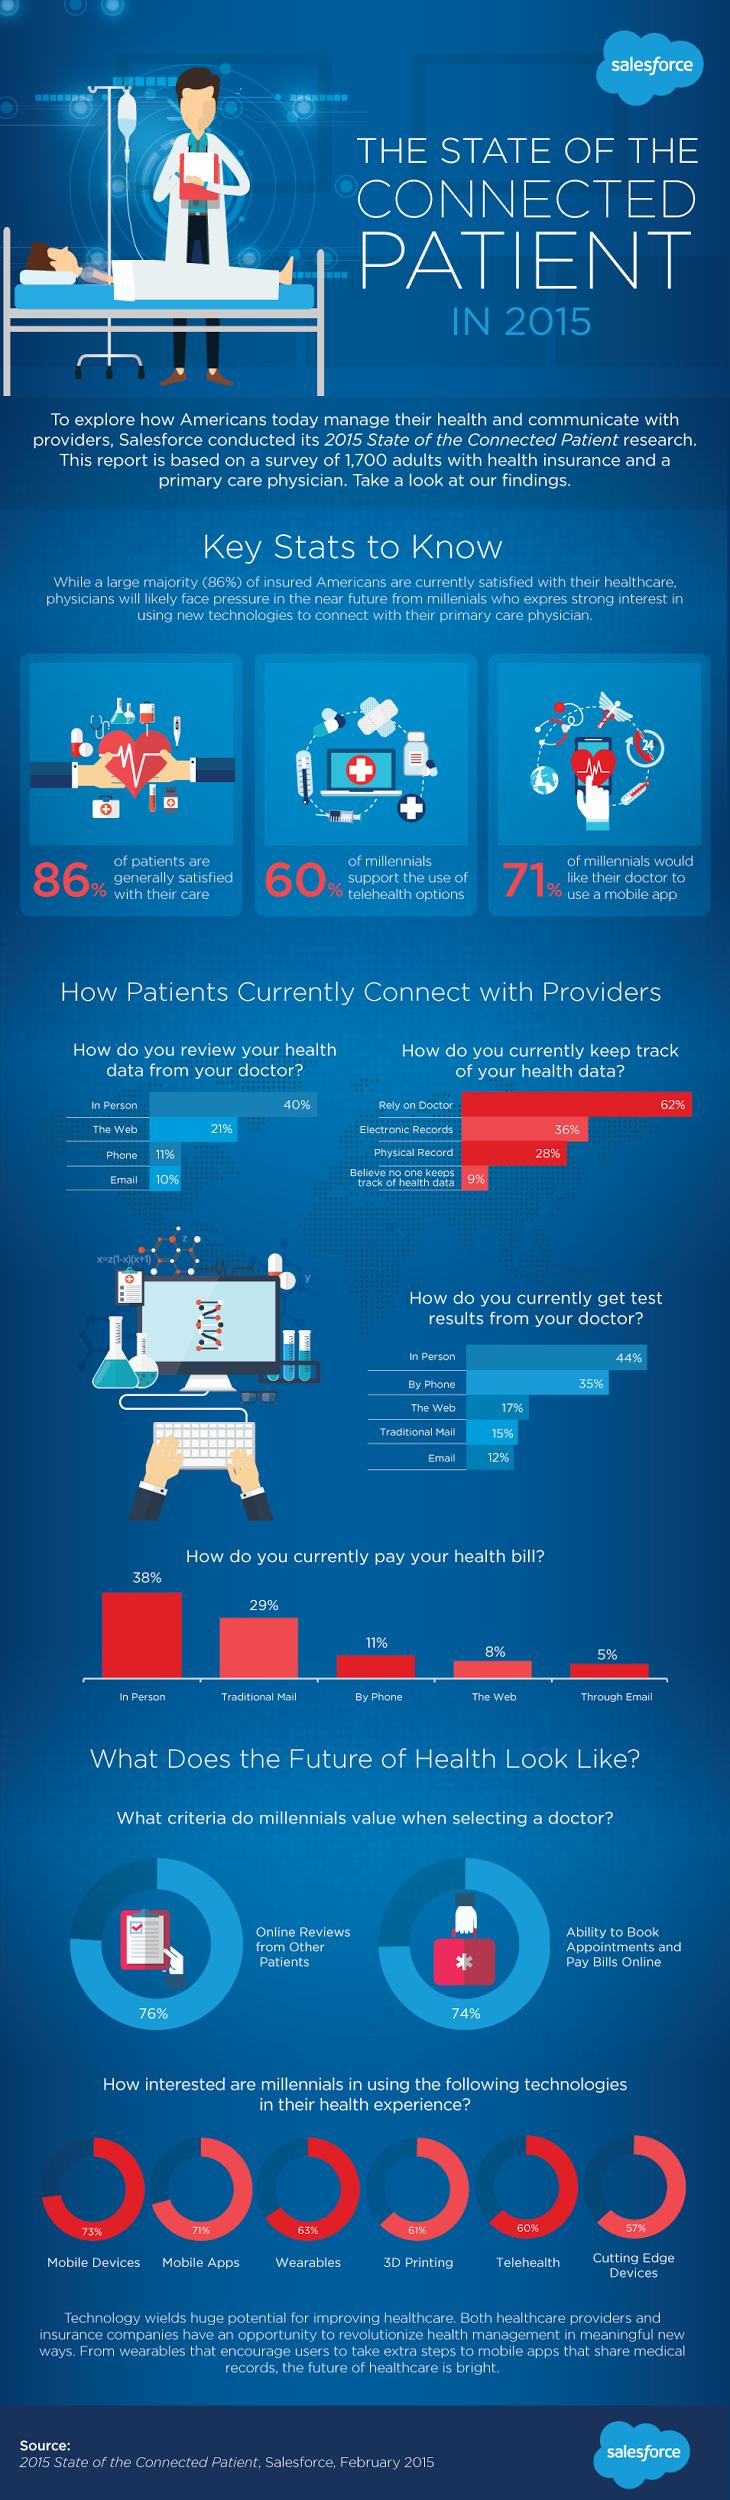 saleforce blog infographic.jpg